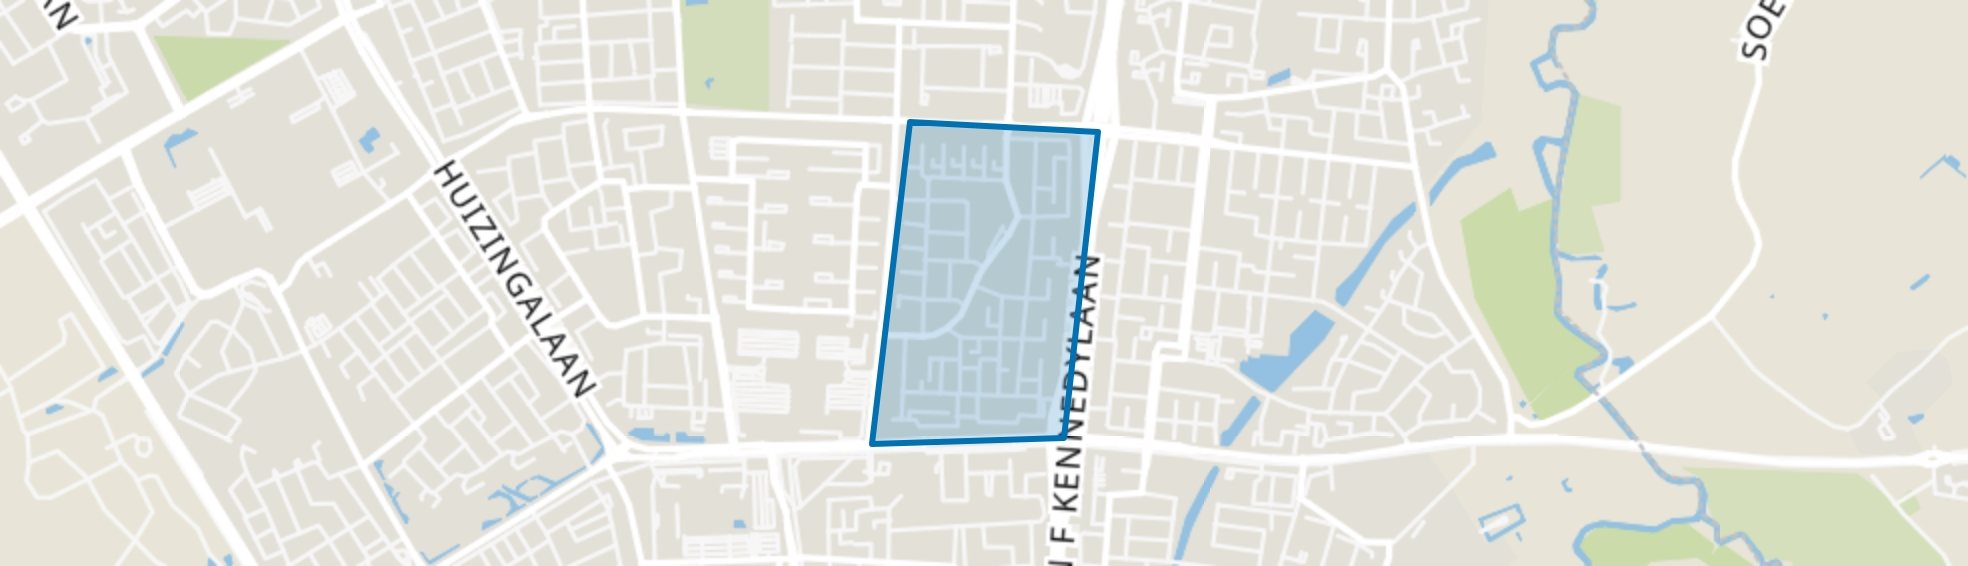 Vlokhoven, Eindhoven map